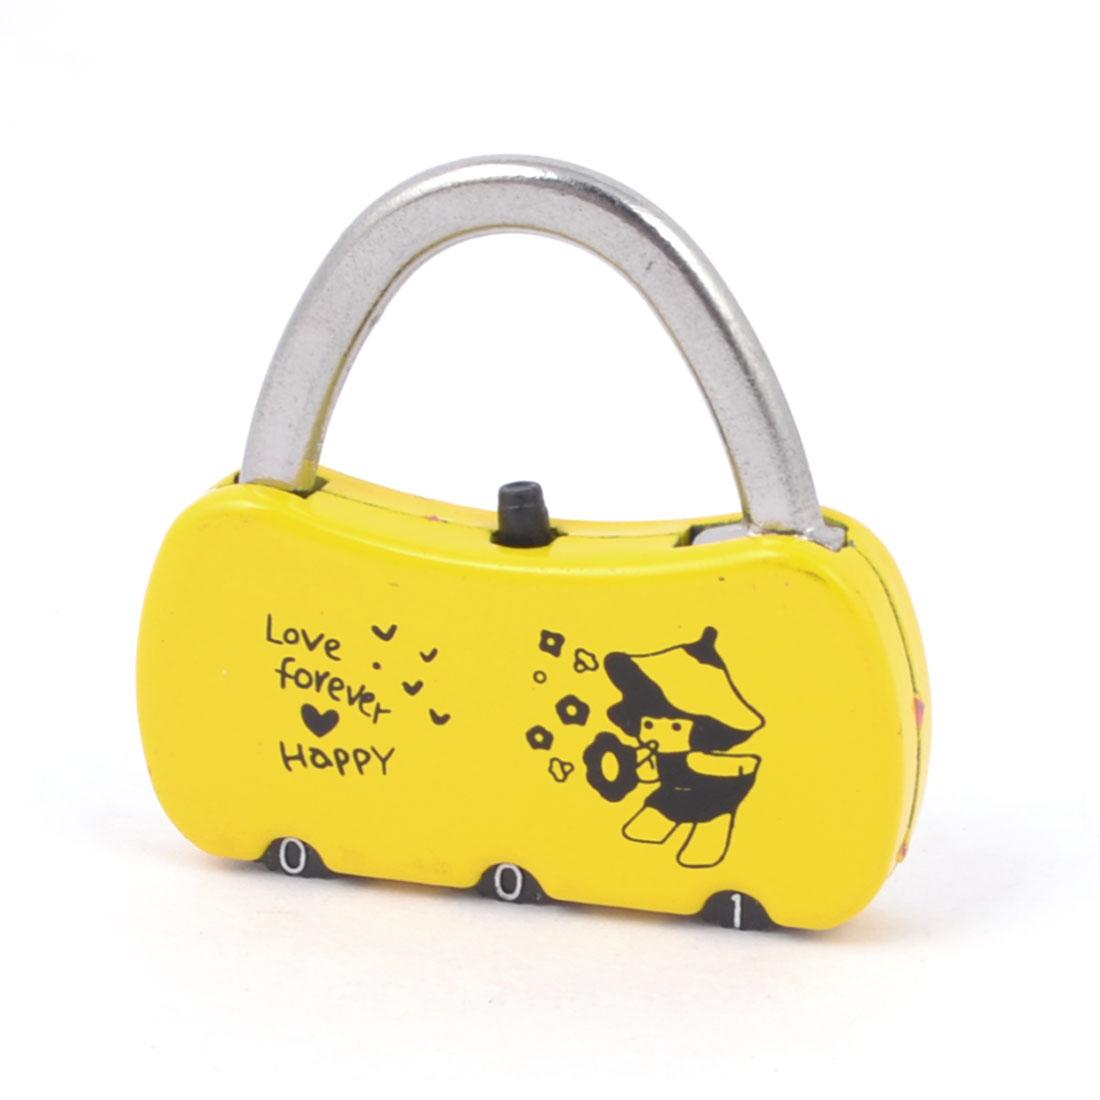 Yellow Bag Shaped Jewelry Box Drawer Combination Password Padlock